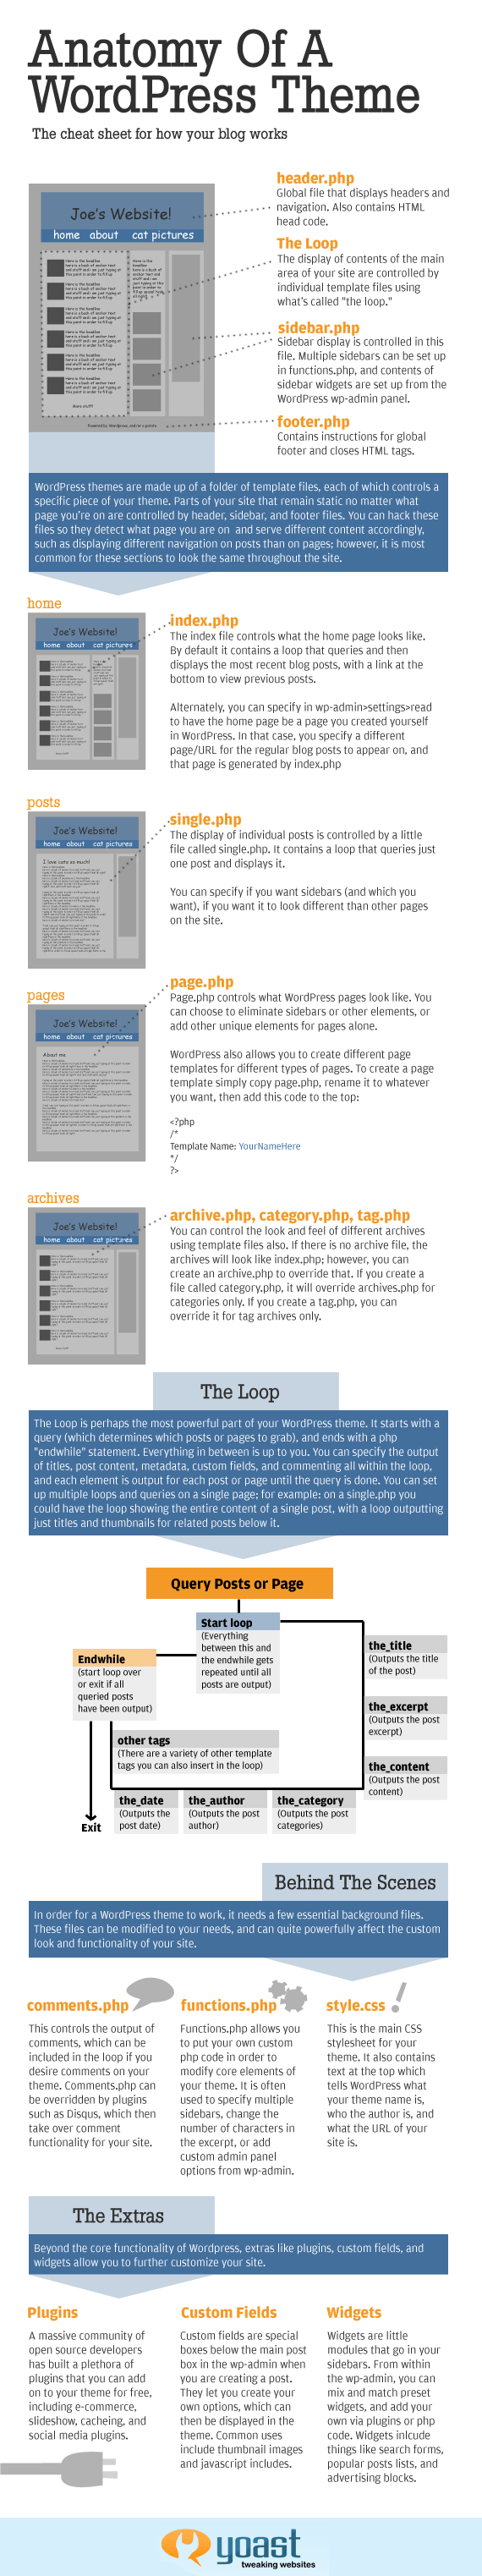 WordPress Anatomy of a Theme Infographic